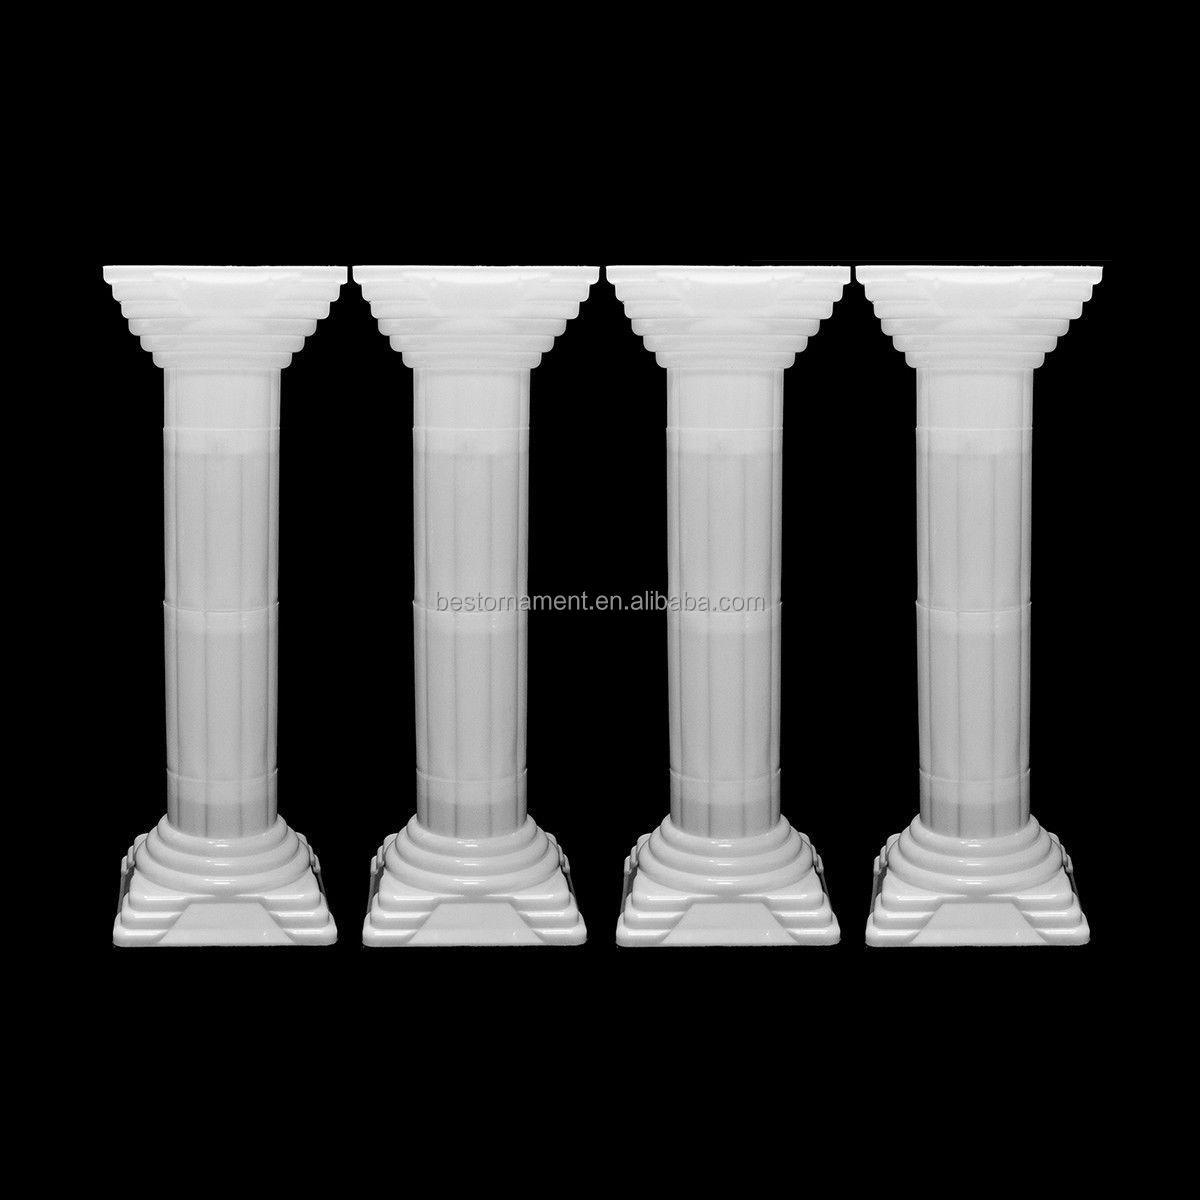 Decorative wedding roman column buy plastic roman for Decorative column